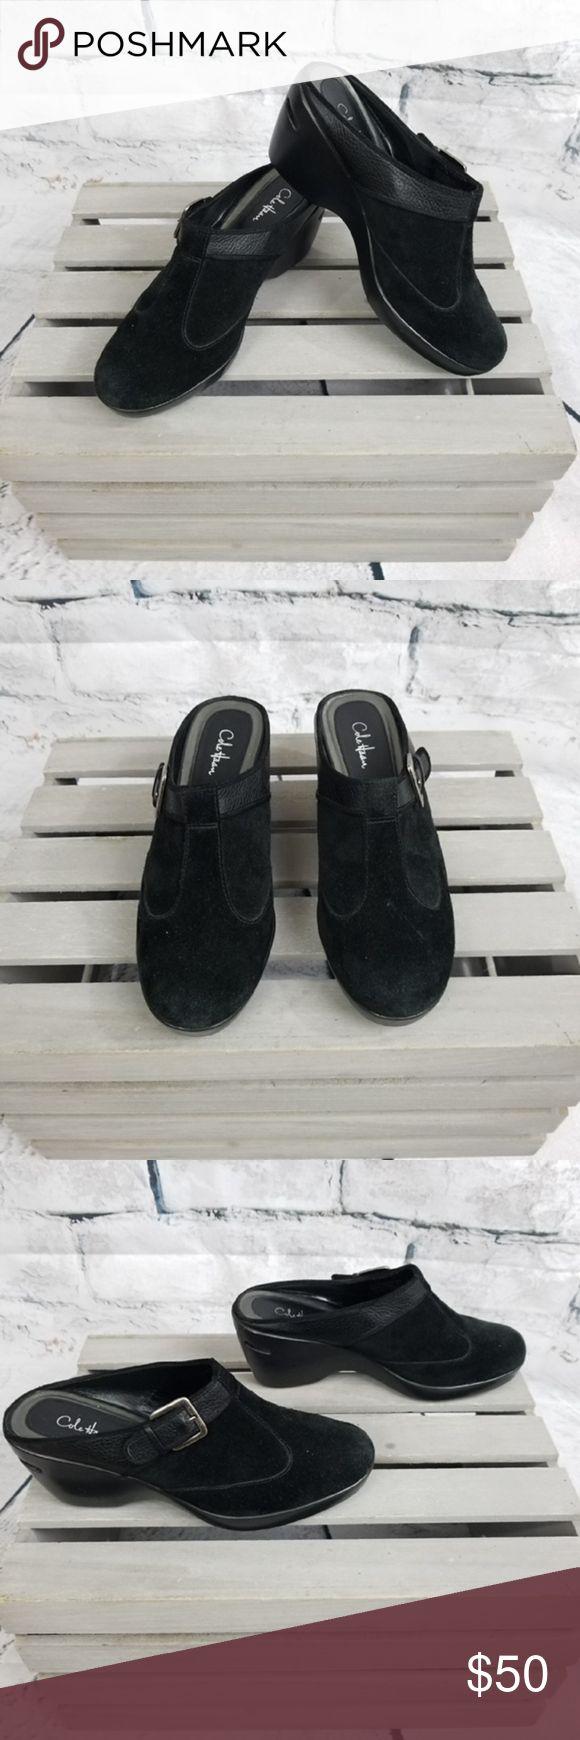 Comfortable 231741 Nike Air Max Men Black Green Shoes